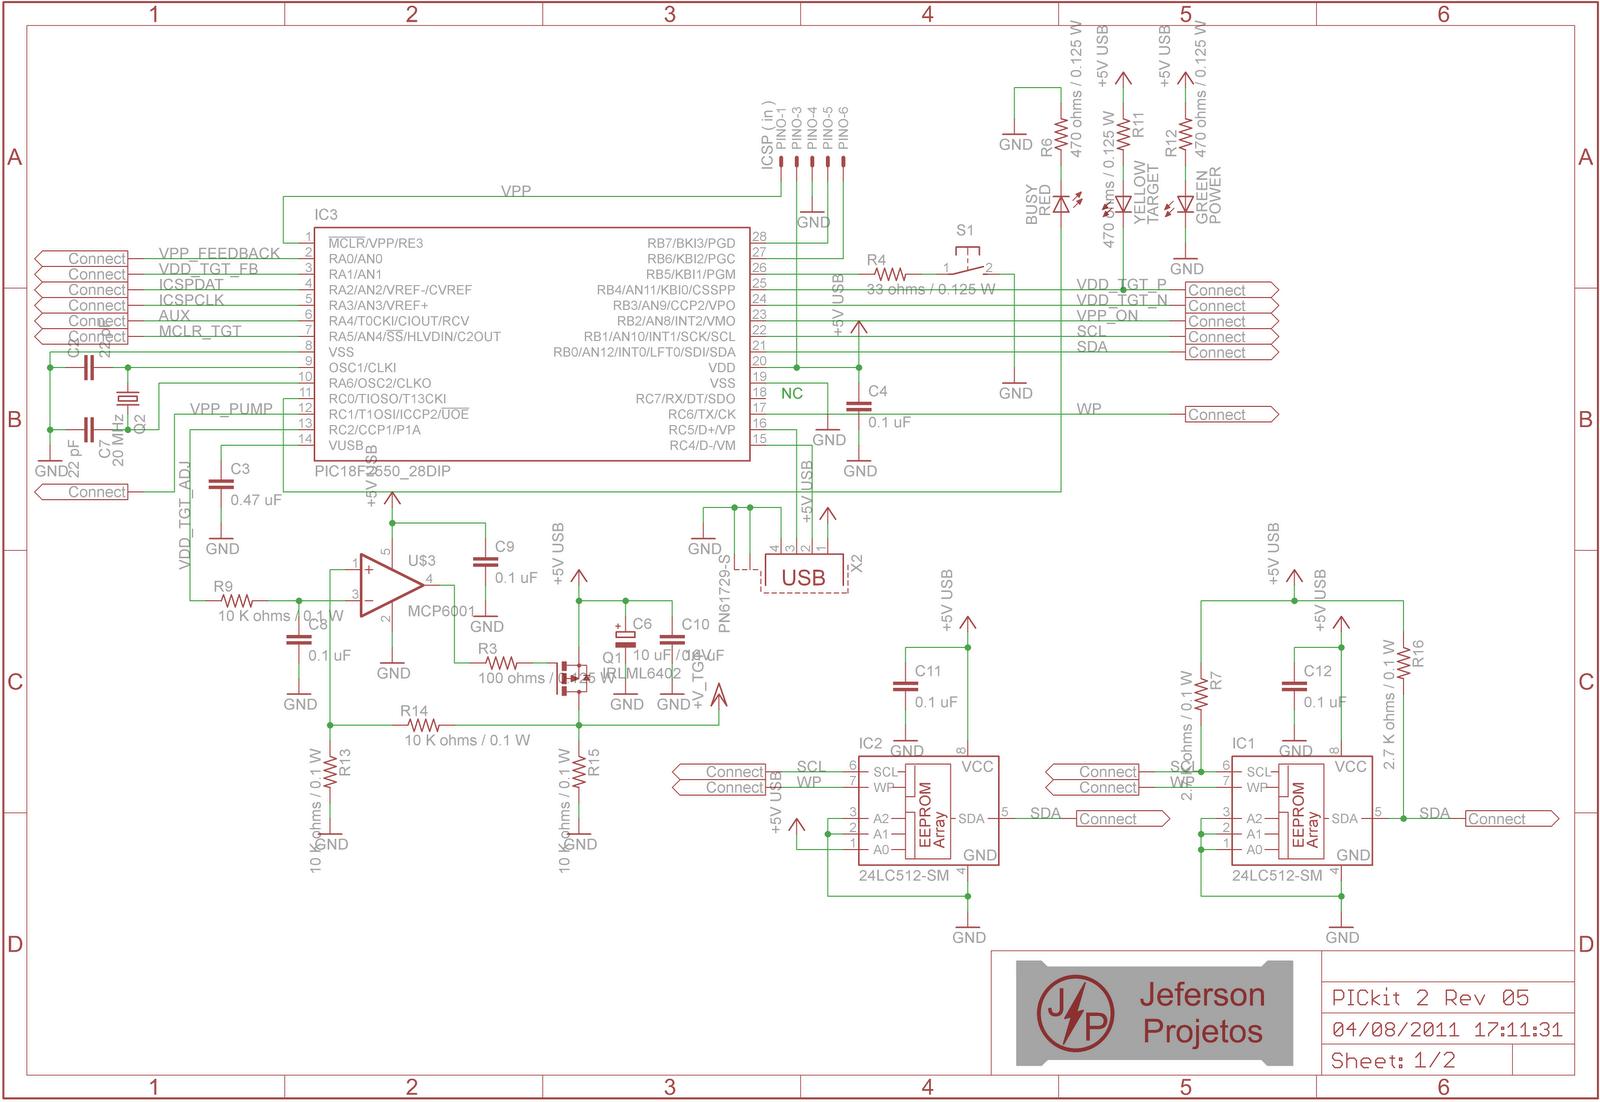 pickit 2 programmer circuit diagram car sound system 3 schematic  readingrat